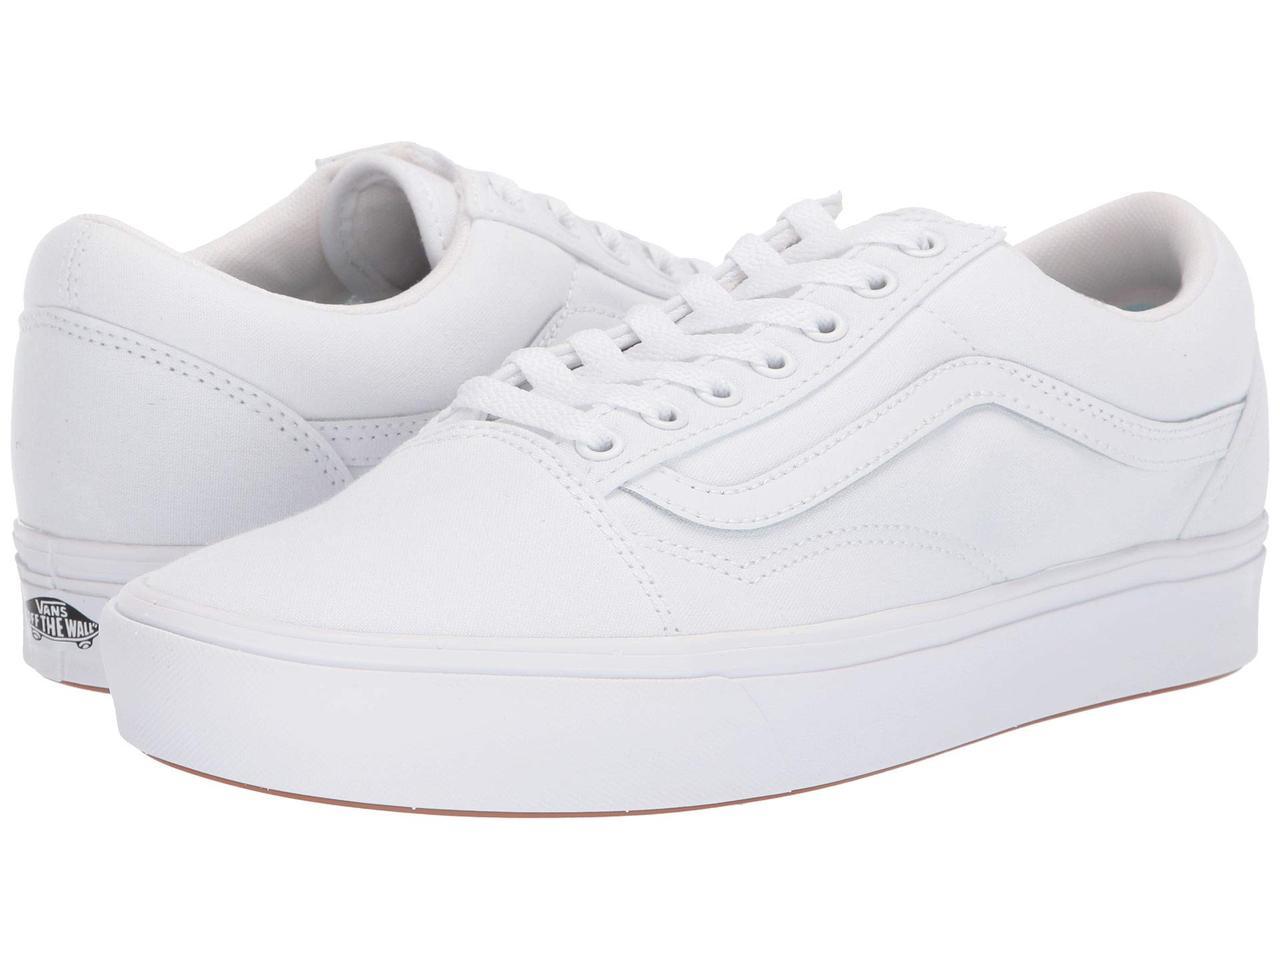 Кроссовки/Кеды (Оригинал) Vans Comfycush Old Skool (Classic) True White/True White